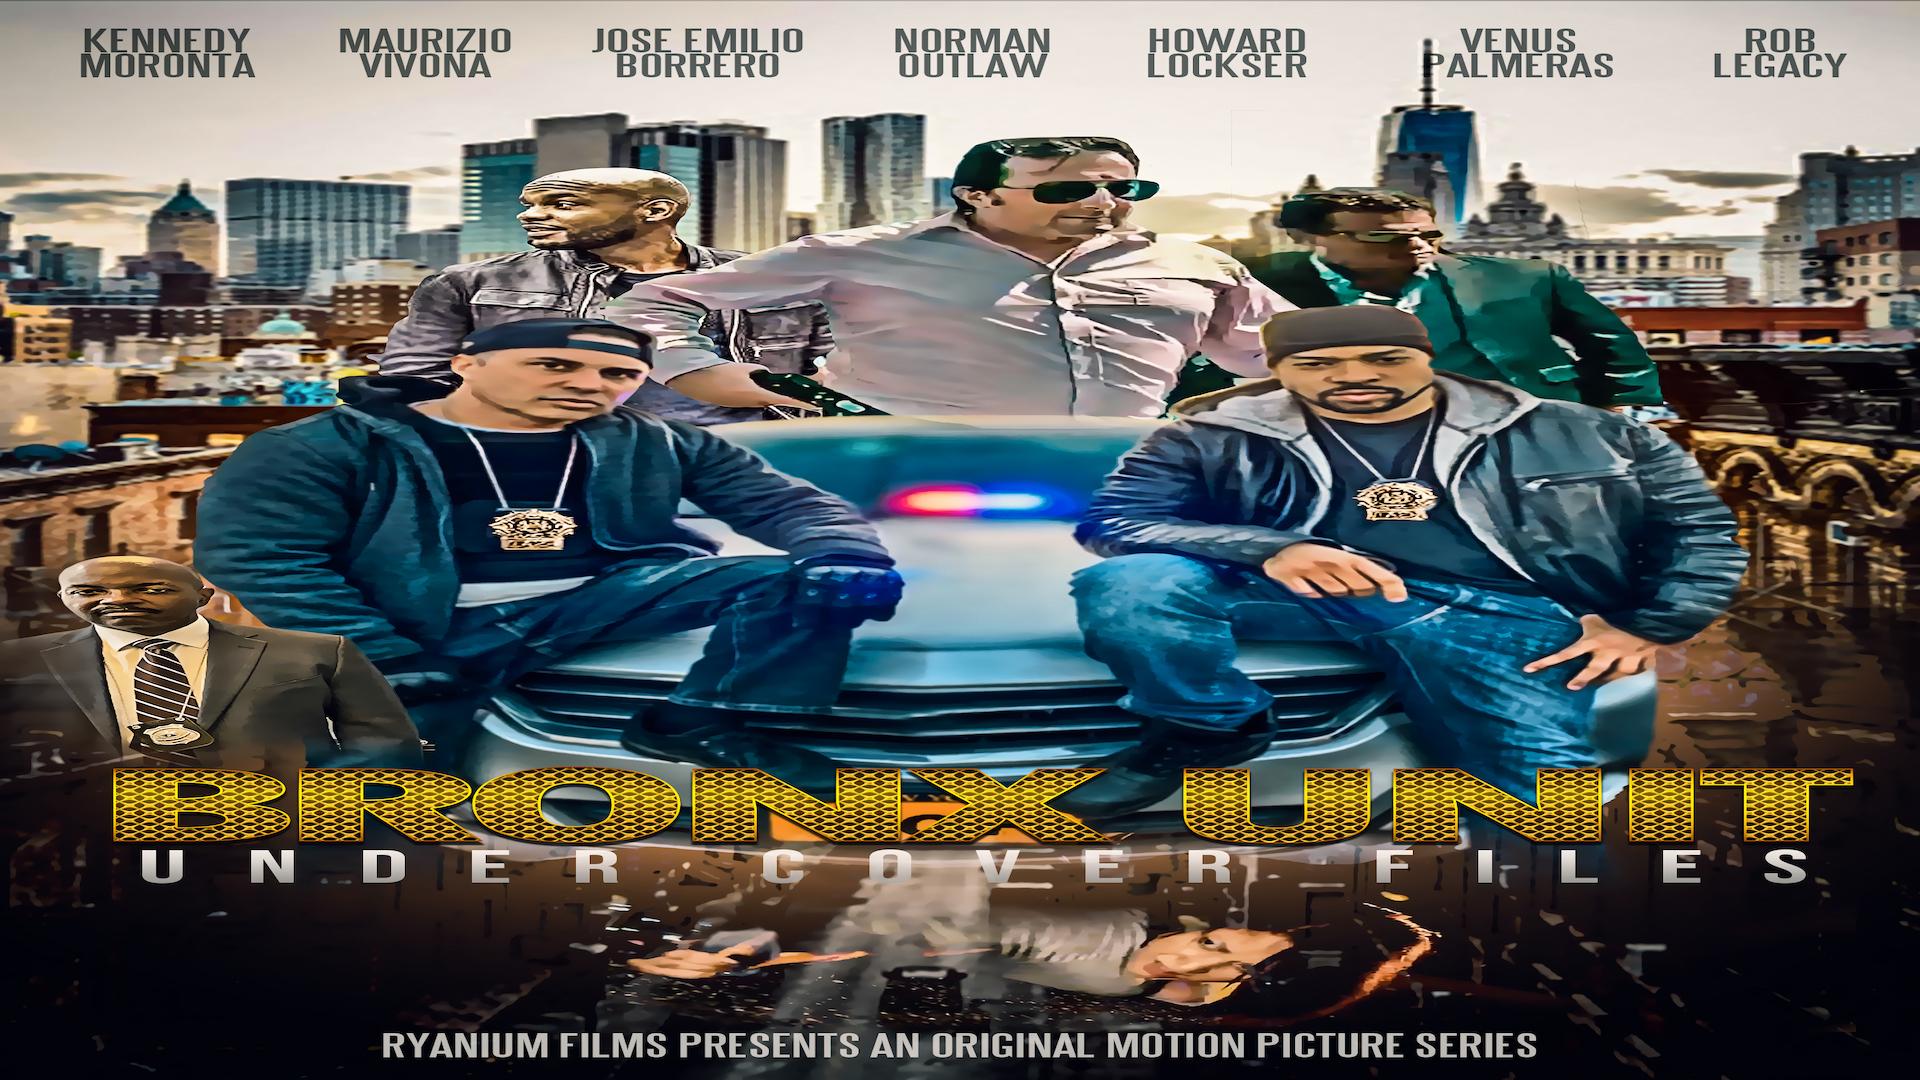 Bronx Unit Undercover Files